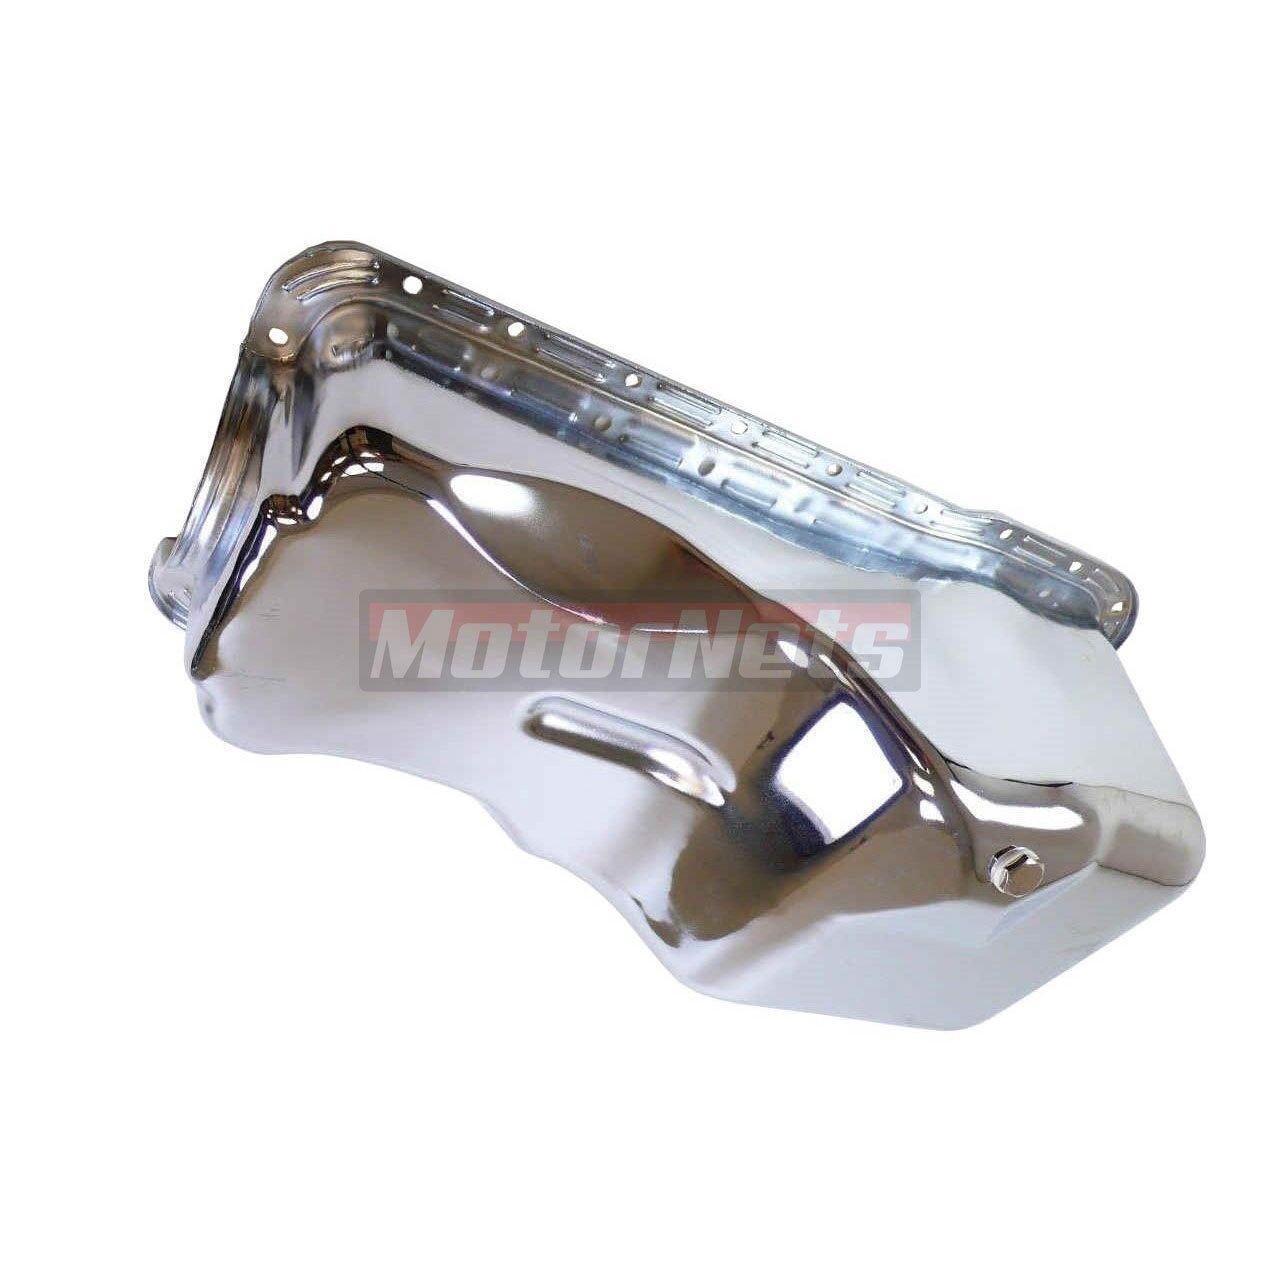 Chrome Dual Sump Oil Pan Stock Capacity 83-93 Ford 5.0 Mustang 302 SBF